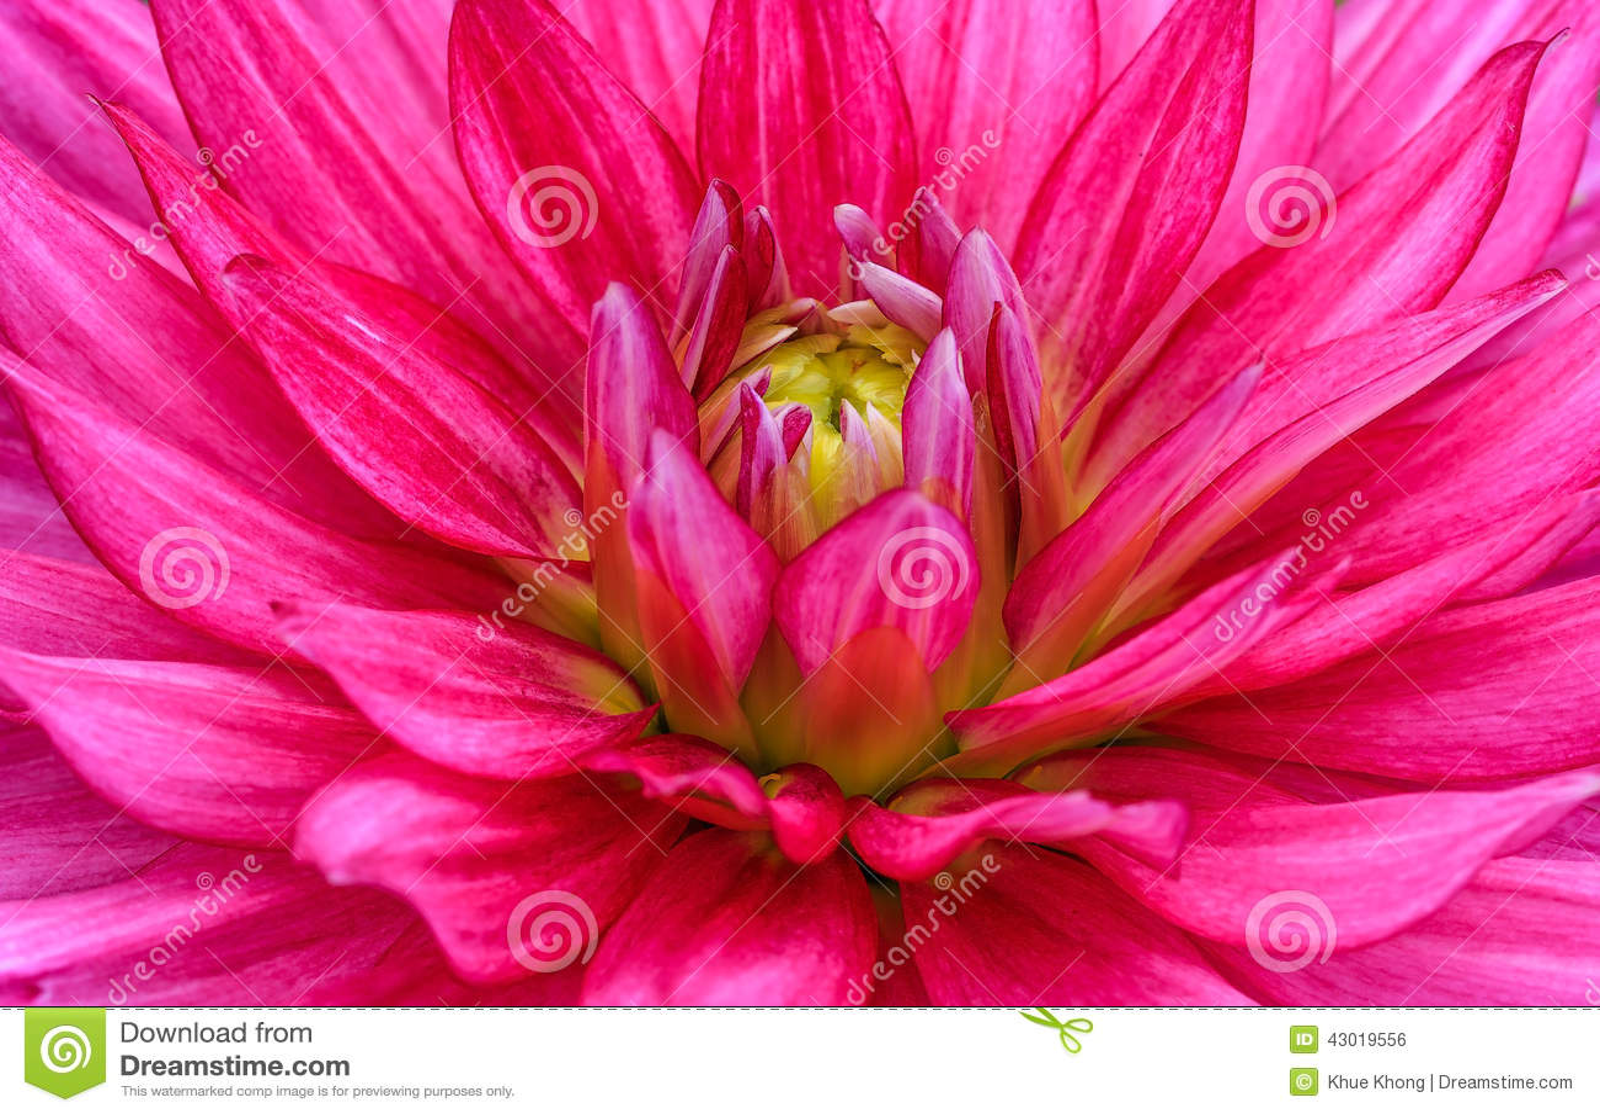 dahlia rouge en gros plan en fleur photo stock - image: 43019556